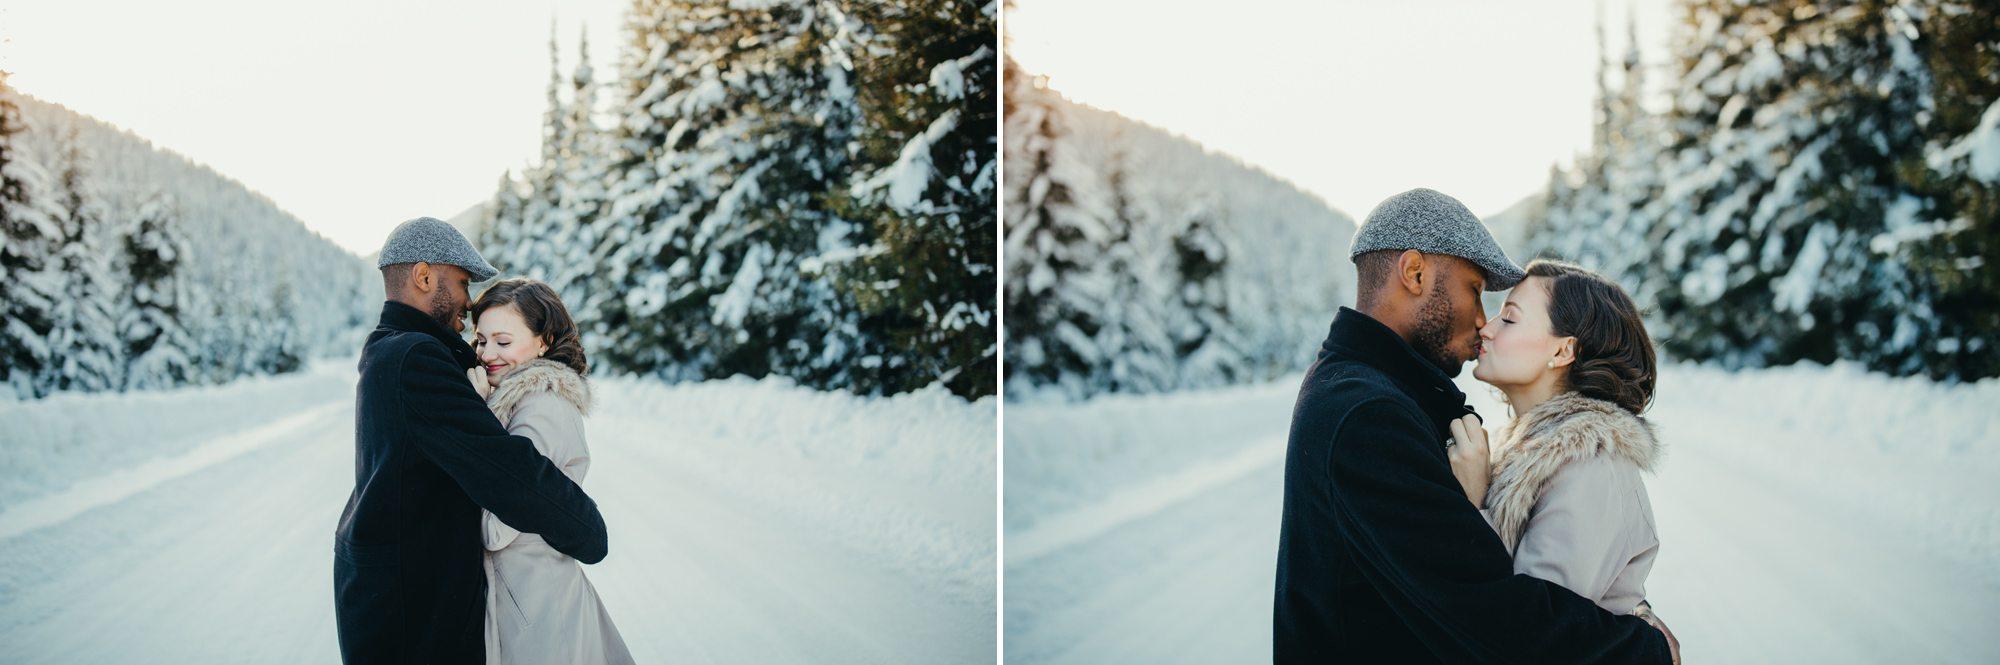 009-adventure-engagement-photographer